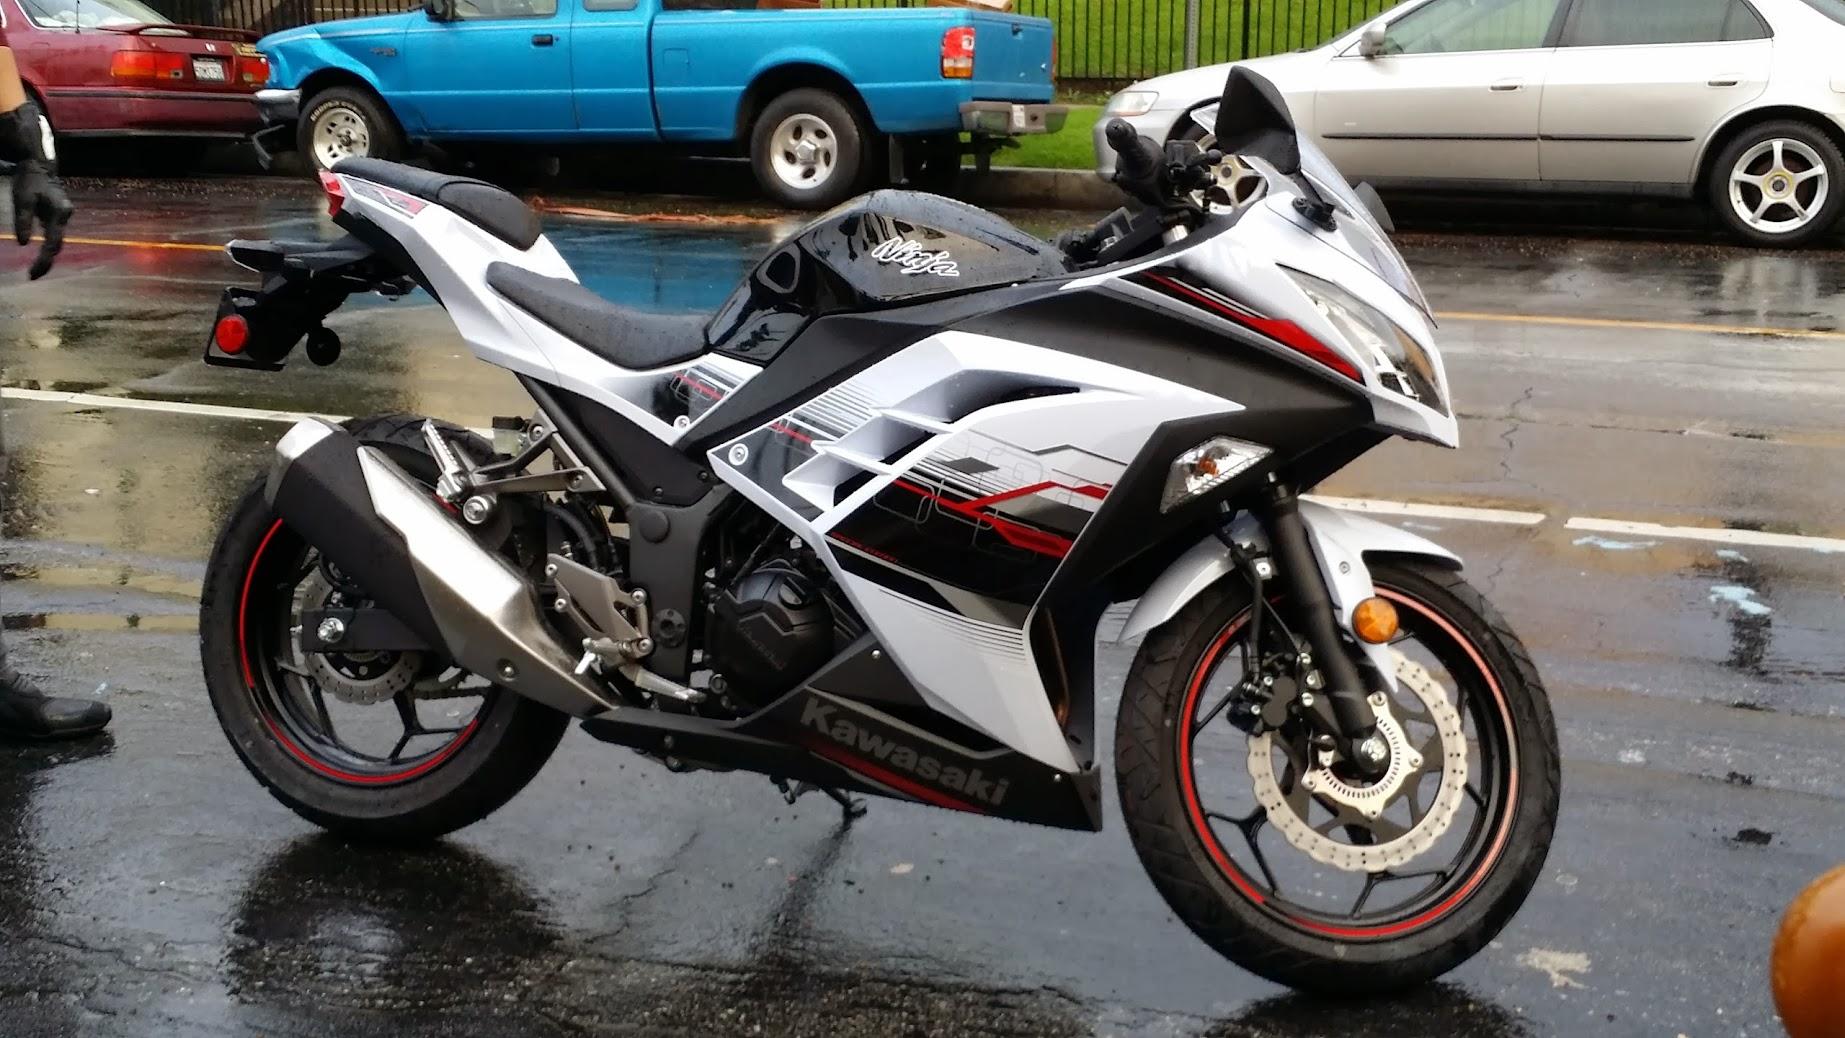 Biker_kitty's Ninja 300 build thread! - Kawasaki Ninja 300 Forum